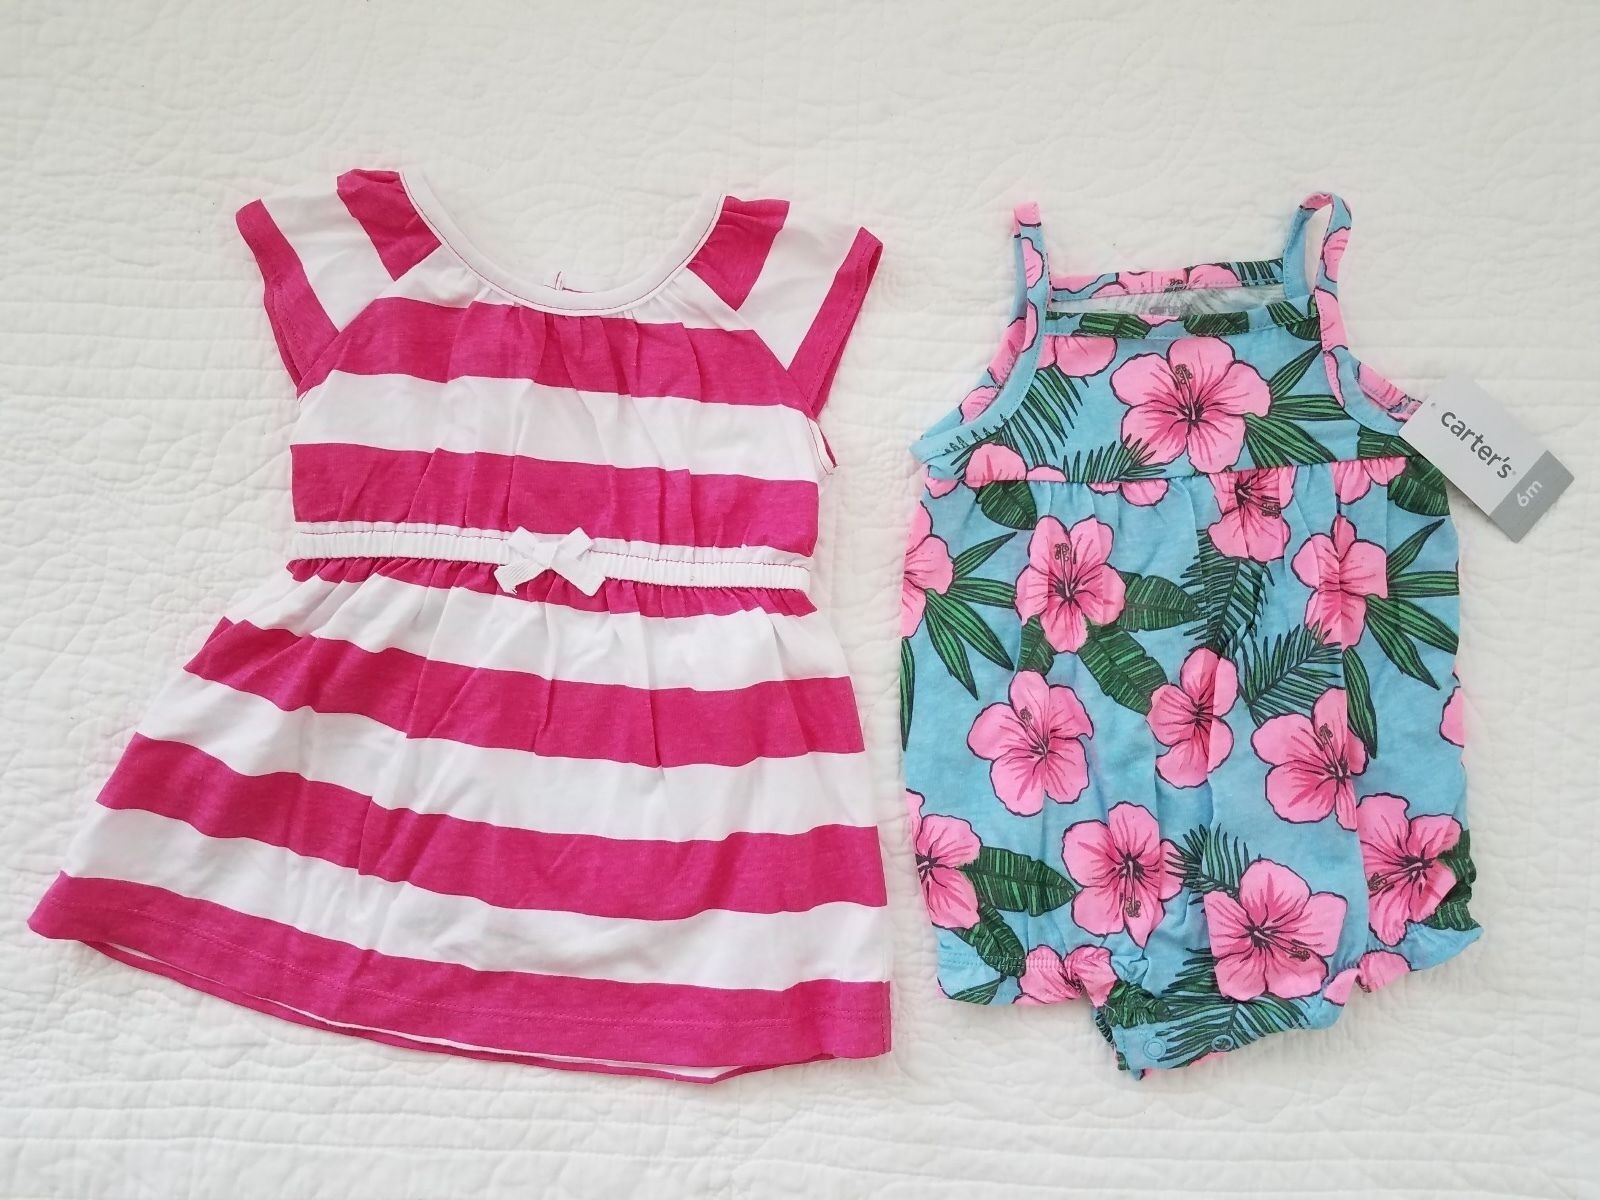 d86284f76 Carters 6 Months Pink Stripe Dress & Tropical Romper Set Baby Girl ...